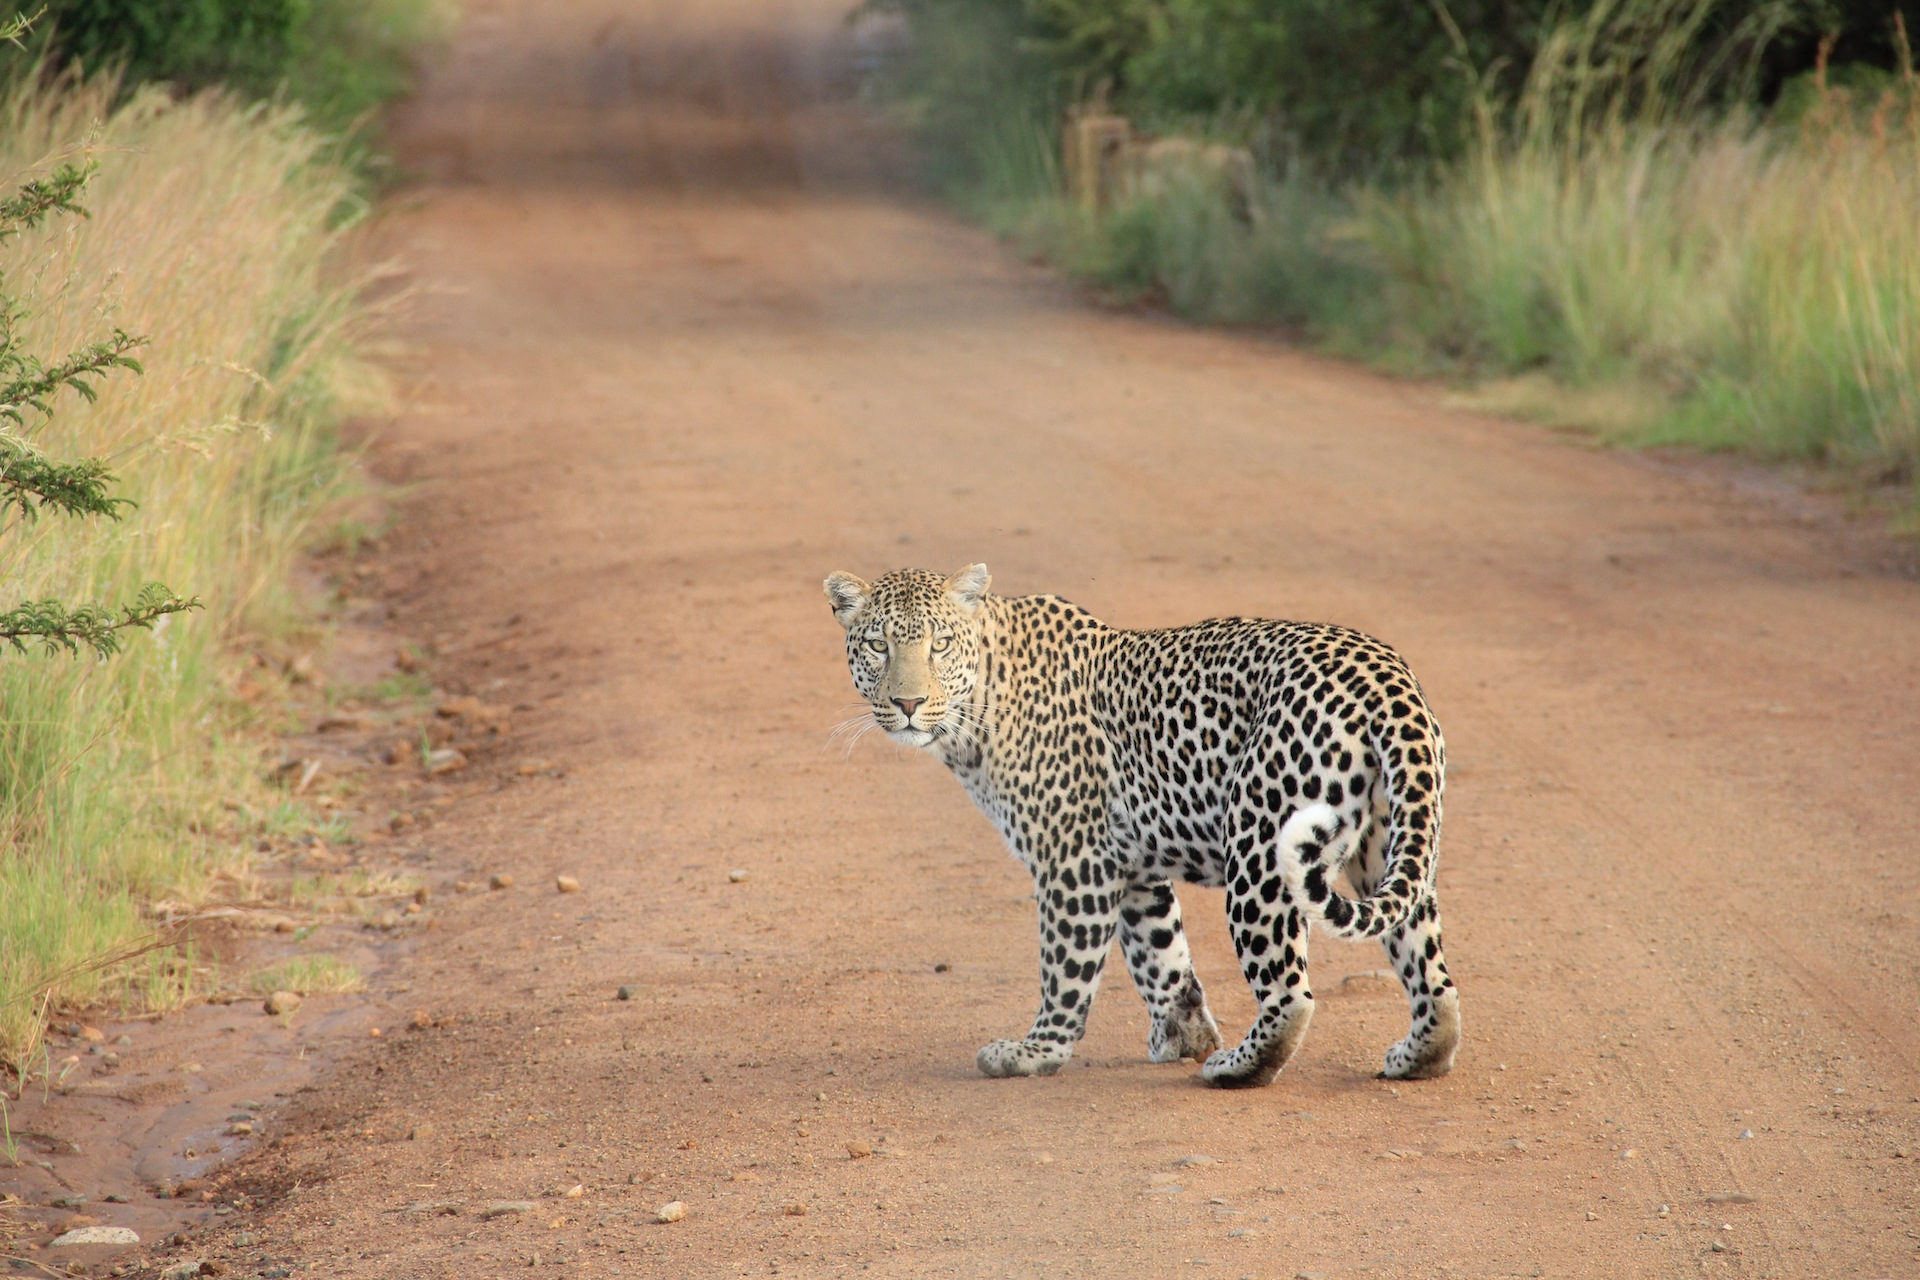 Leopard, felino, Selvagem, Olha, peles - Papéis de parede HD - Professor-falken.com